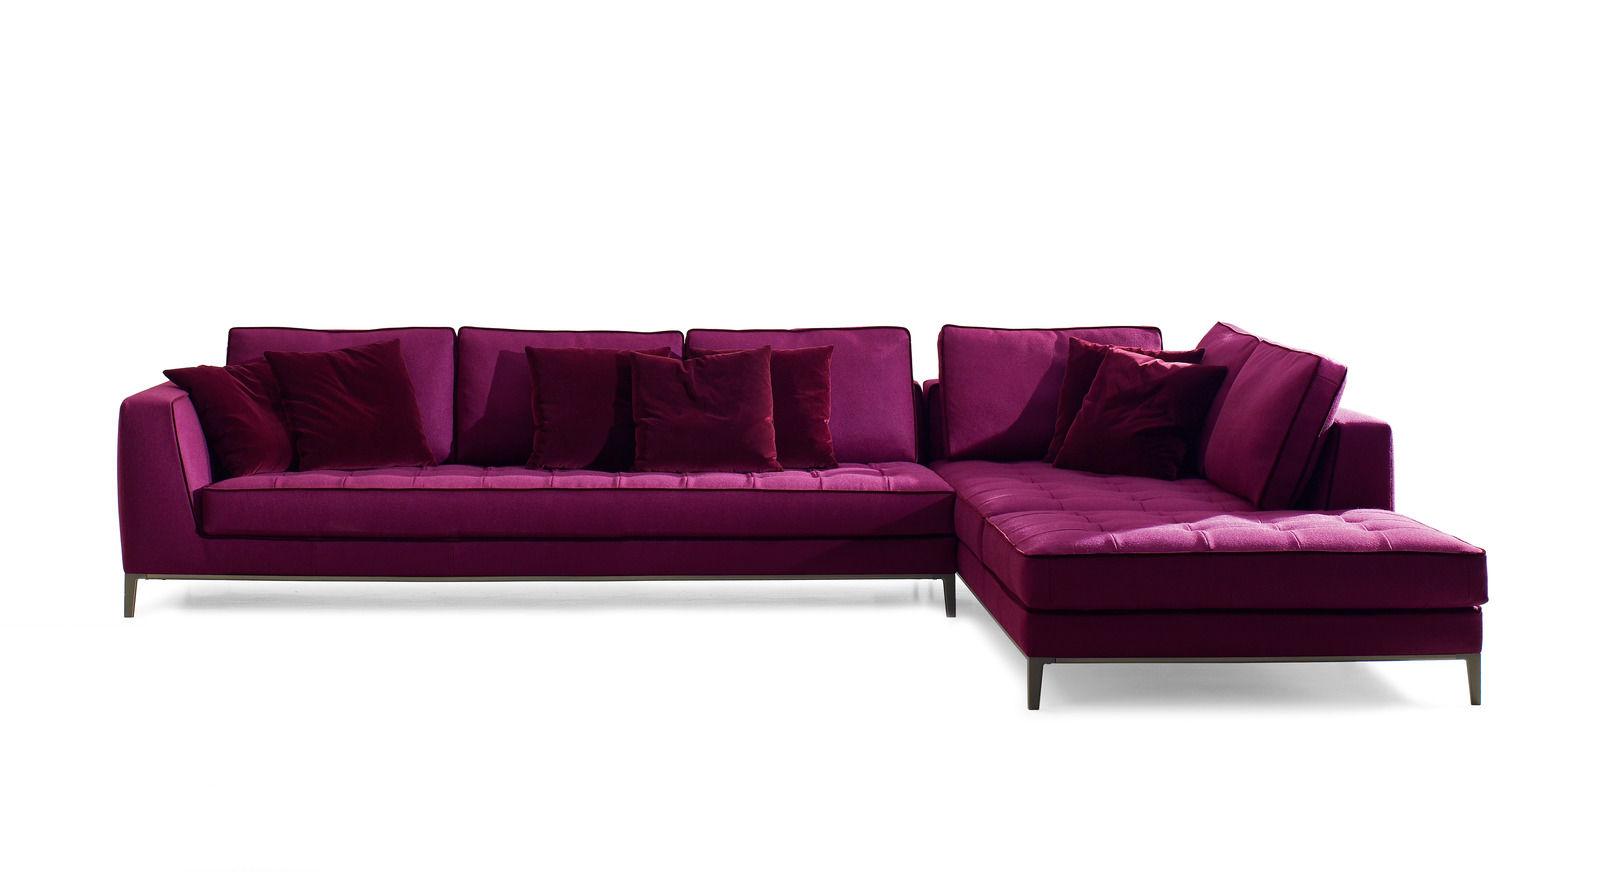 salon marocain canape moderne fashion designs. Black Bedroom Furniture Sets. Home Design Ideas